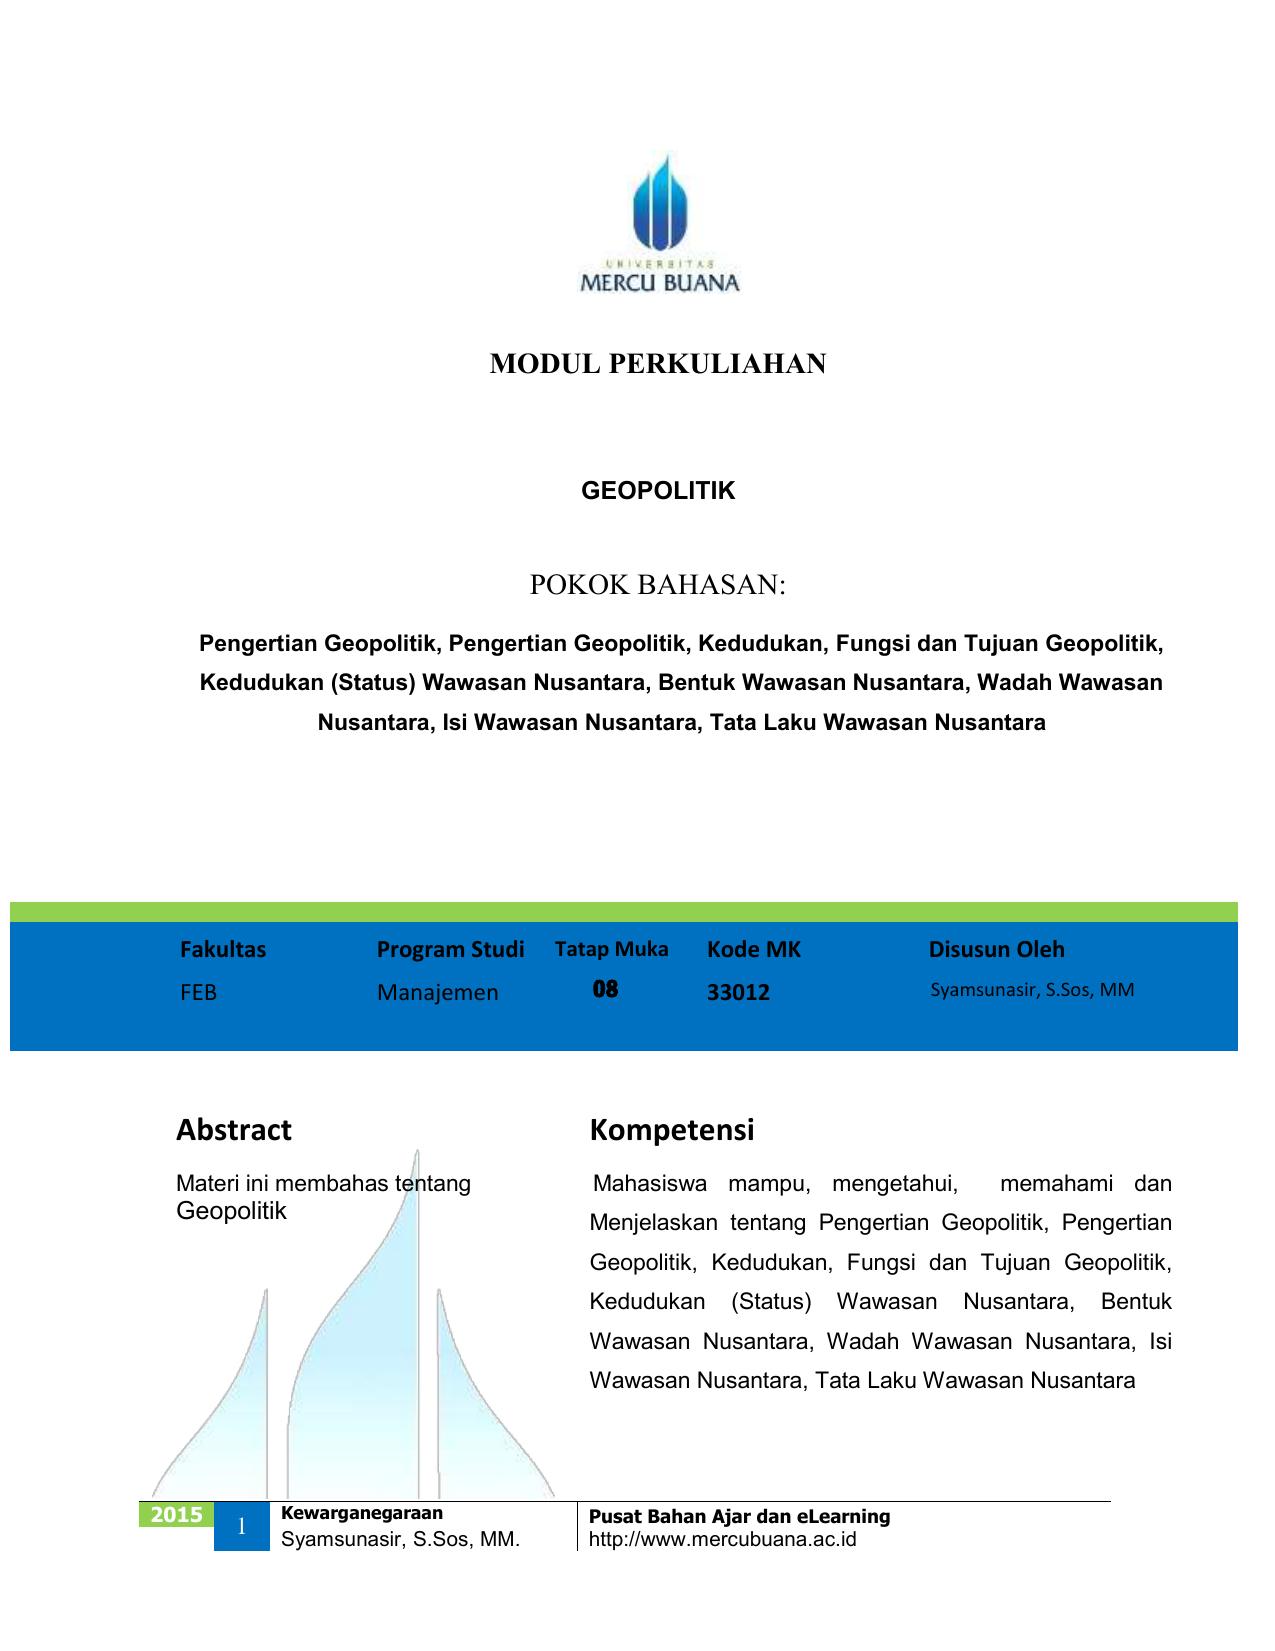 I  Implementasi Wawasan Nusantara